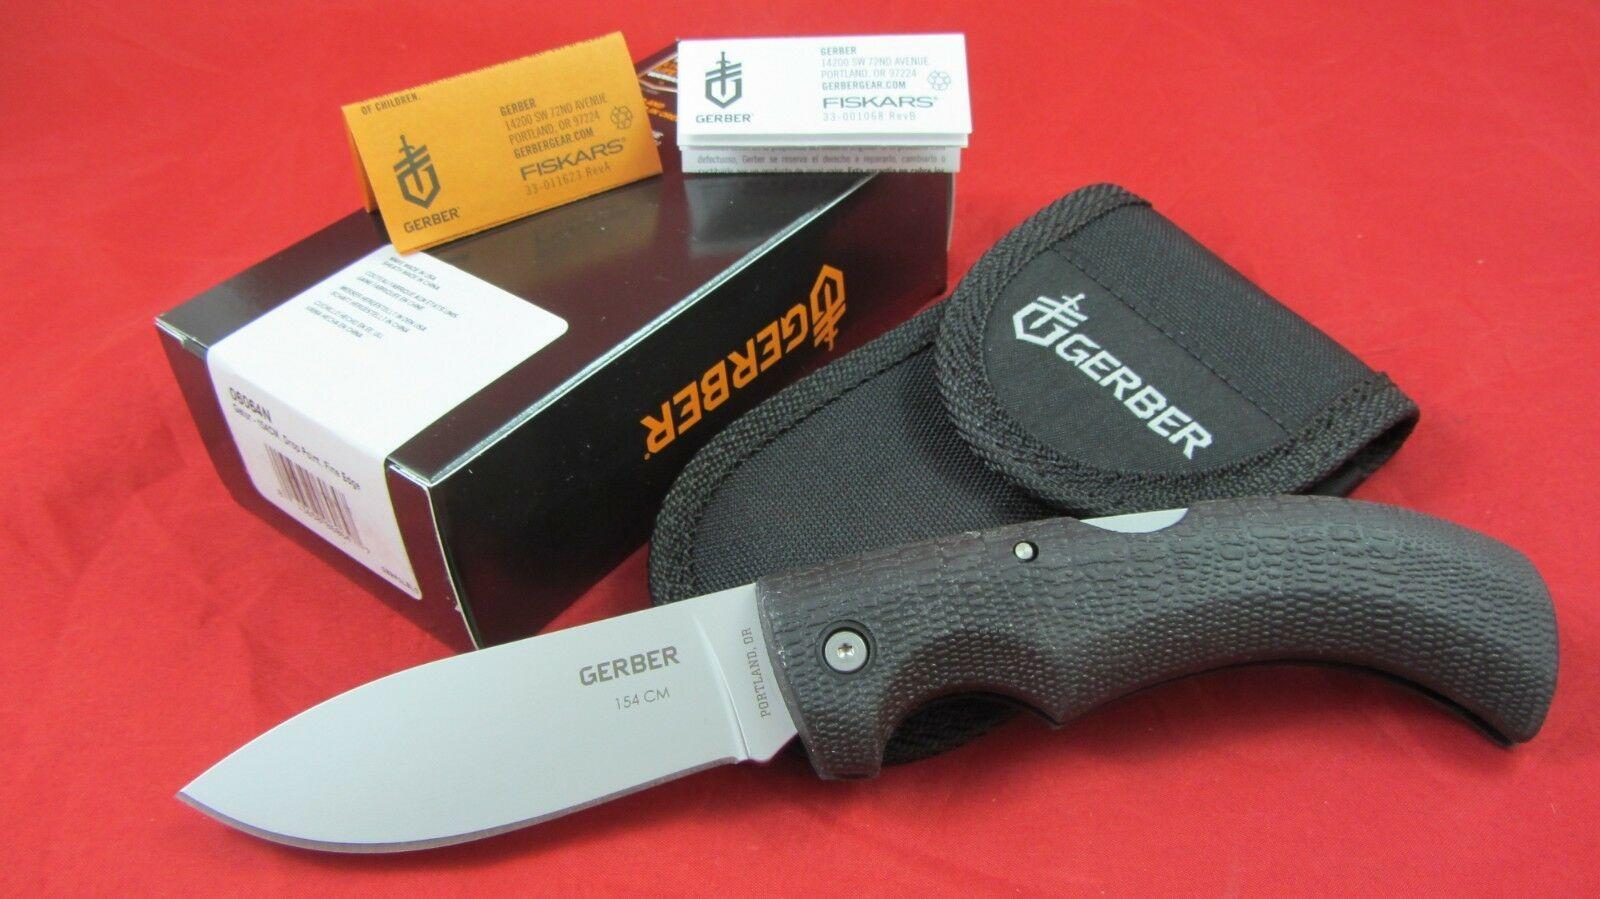 Фото 8 - Складной нож Gerber Gator 154, сталь 154CM, рукоять glassfilled